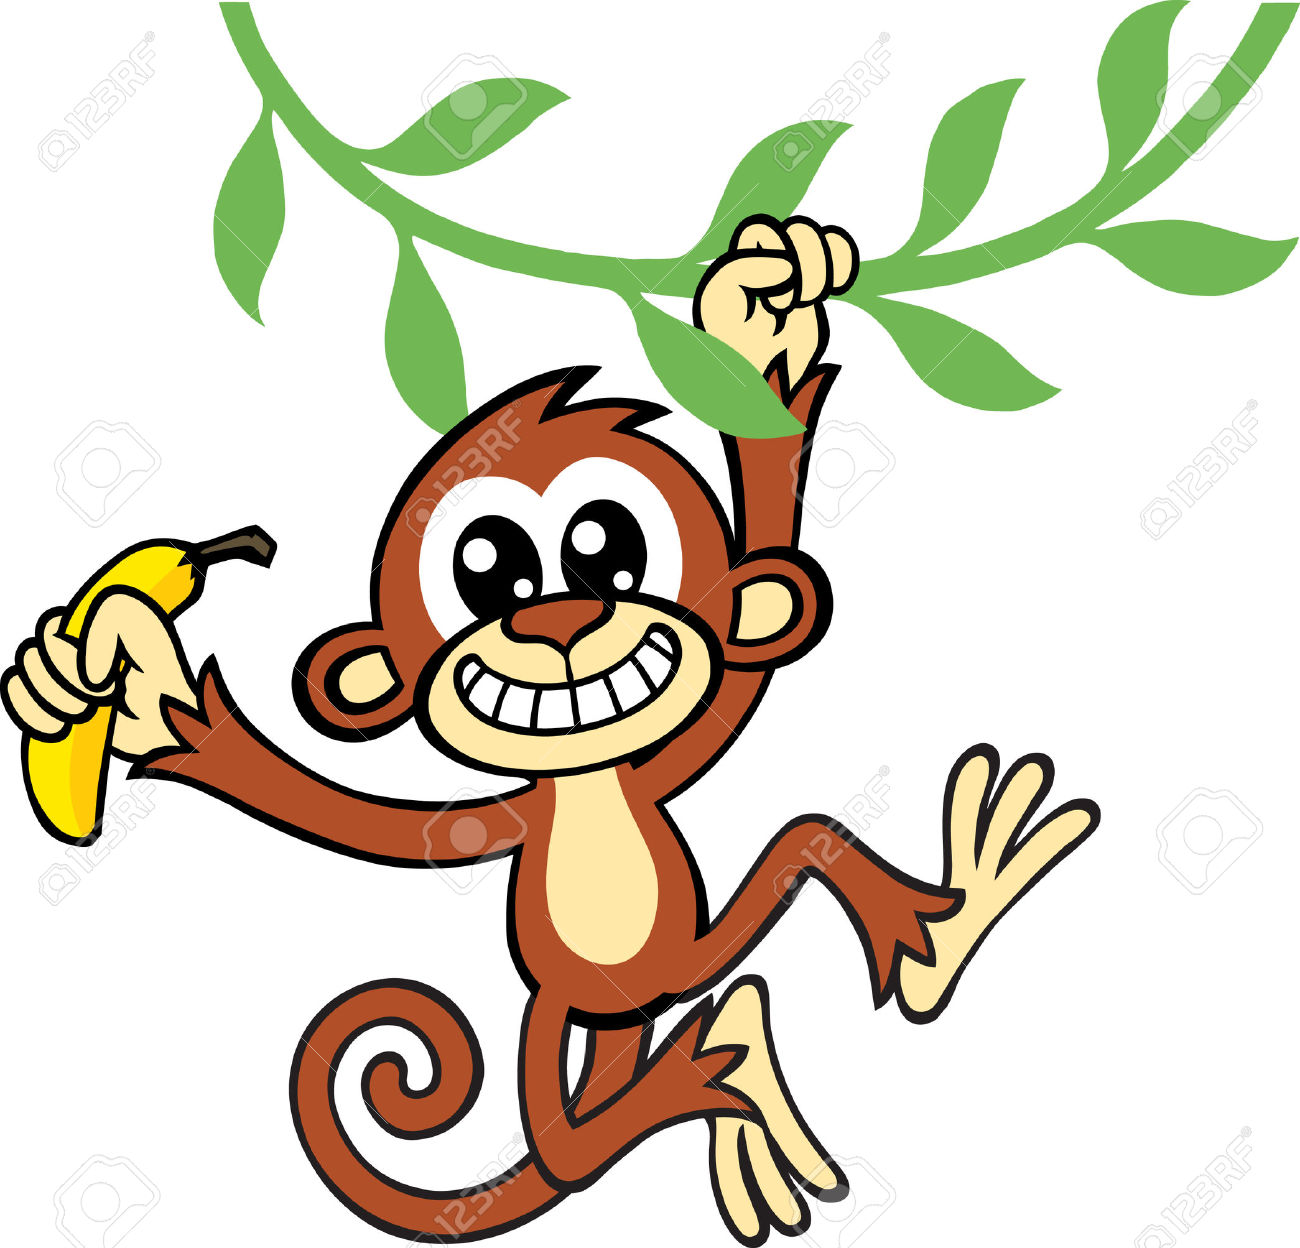 Monkey on vine clipart image royalty free download Free Monkey Clipart | Free download best Free Monkey Clipart ... image royalty free download